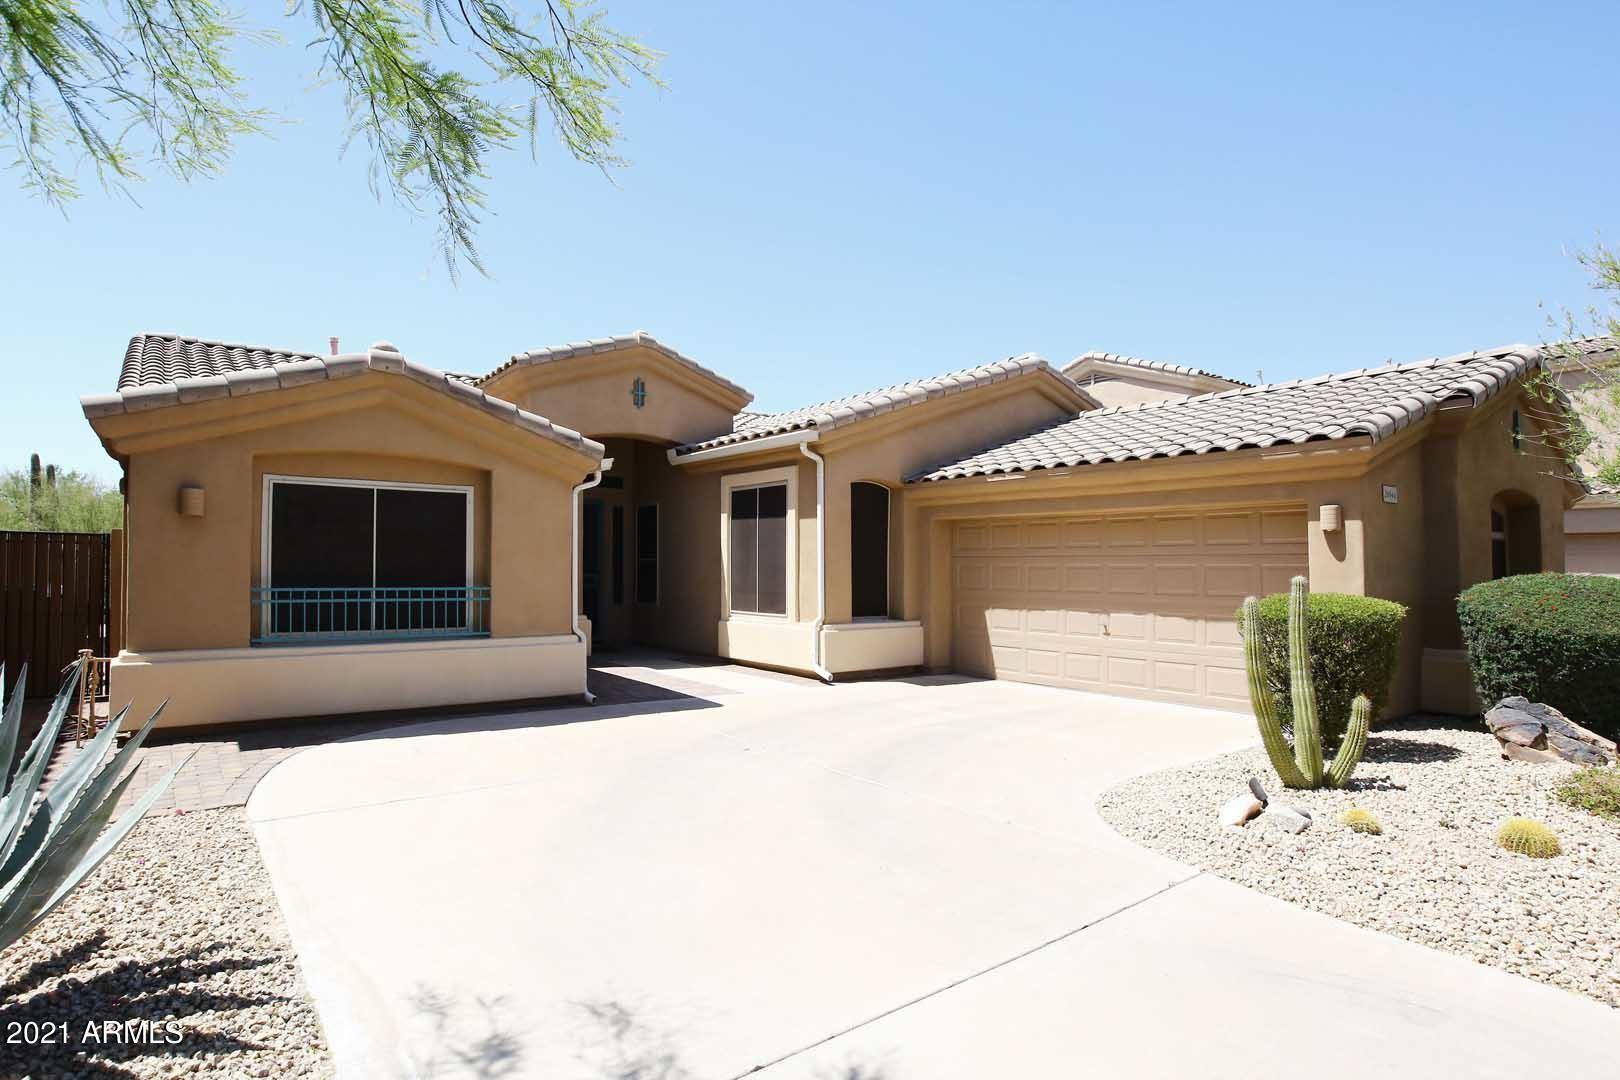 Photo of 24544 N 74TH Place, Scottsdale, AZ 85255 (MLS # 6229685)